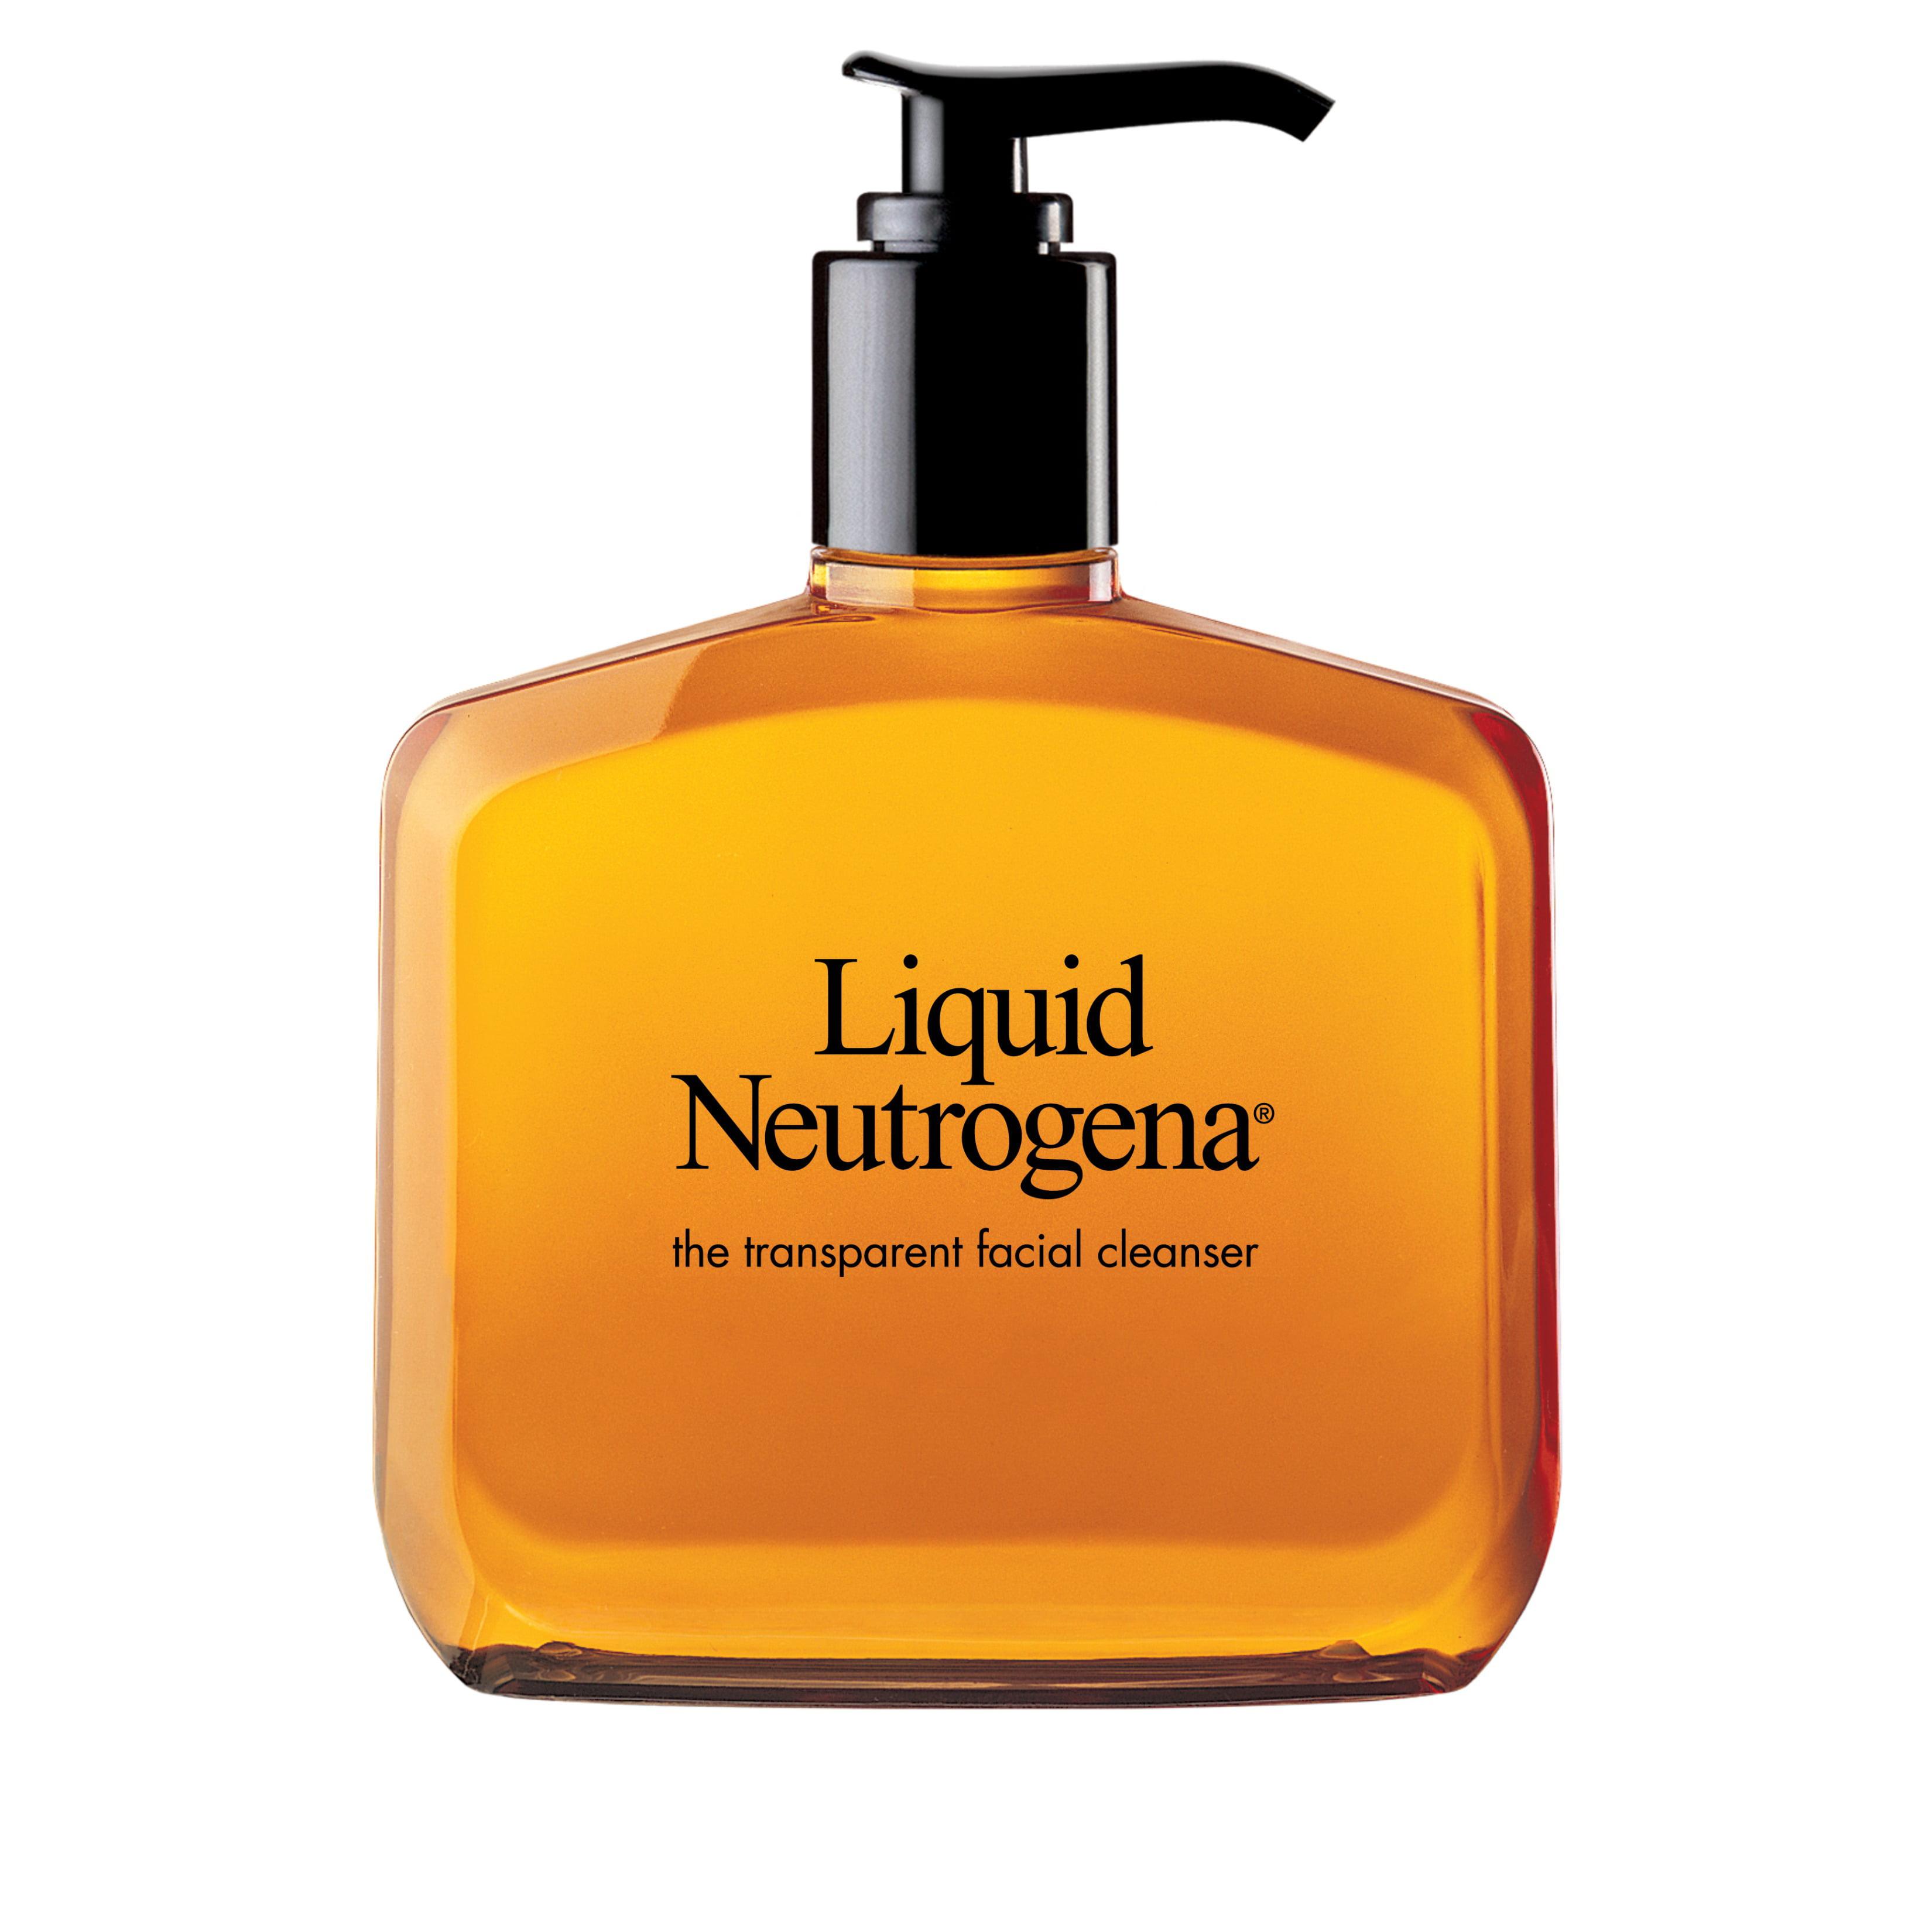 Liquid Neutrogena Fragrance-Free Mild Facial Cleanser, 8 fl. oz